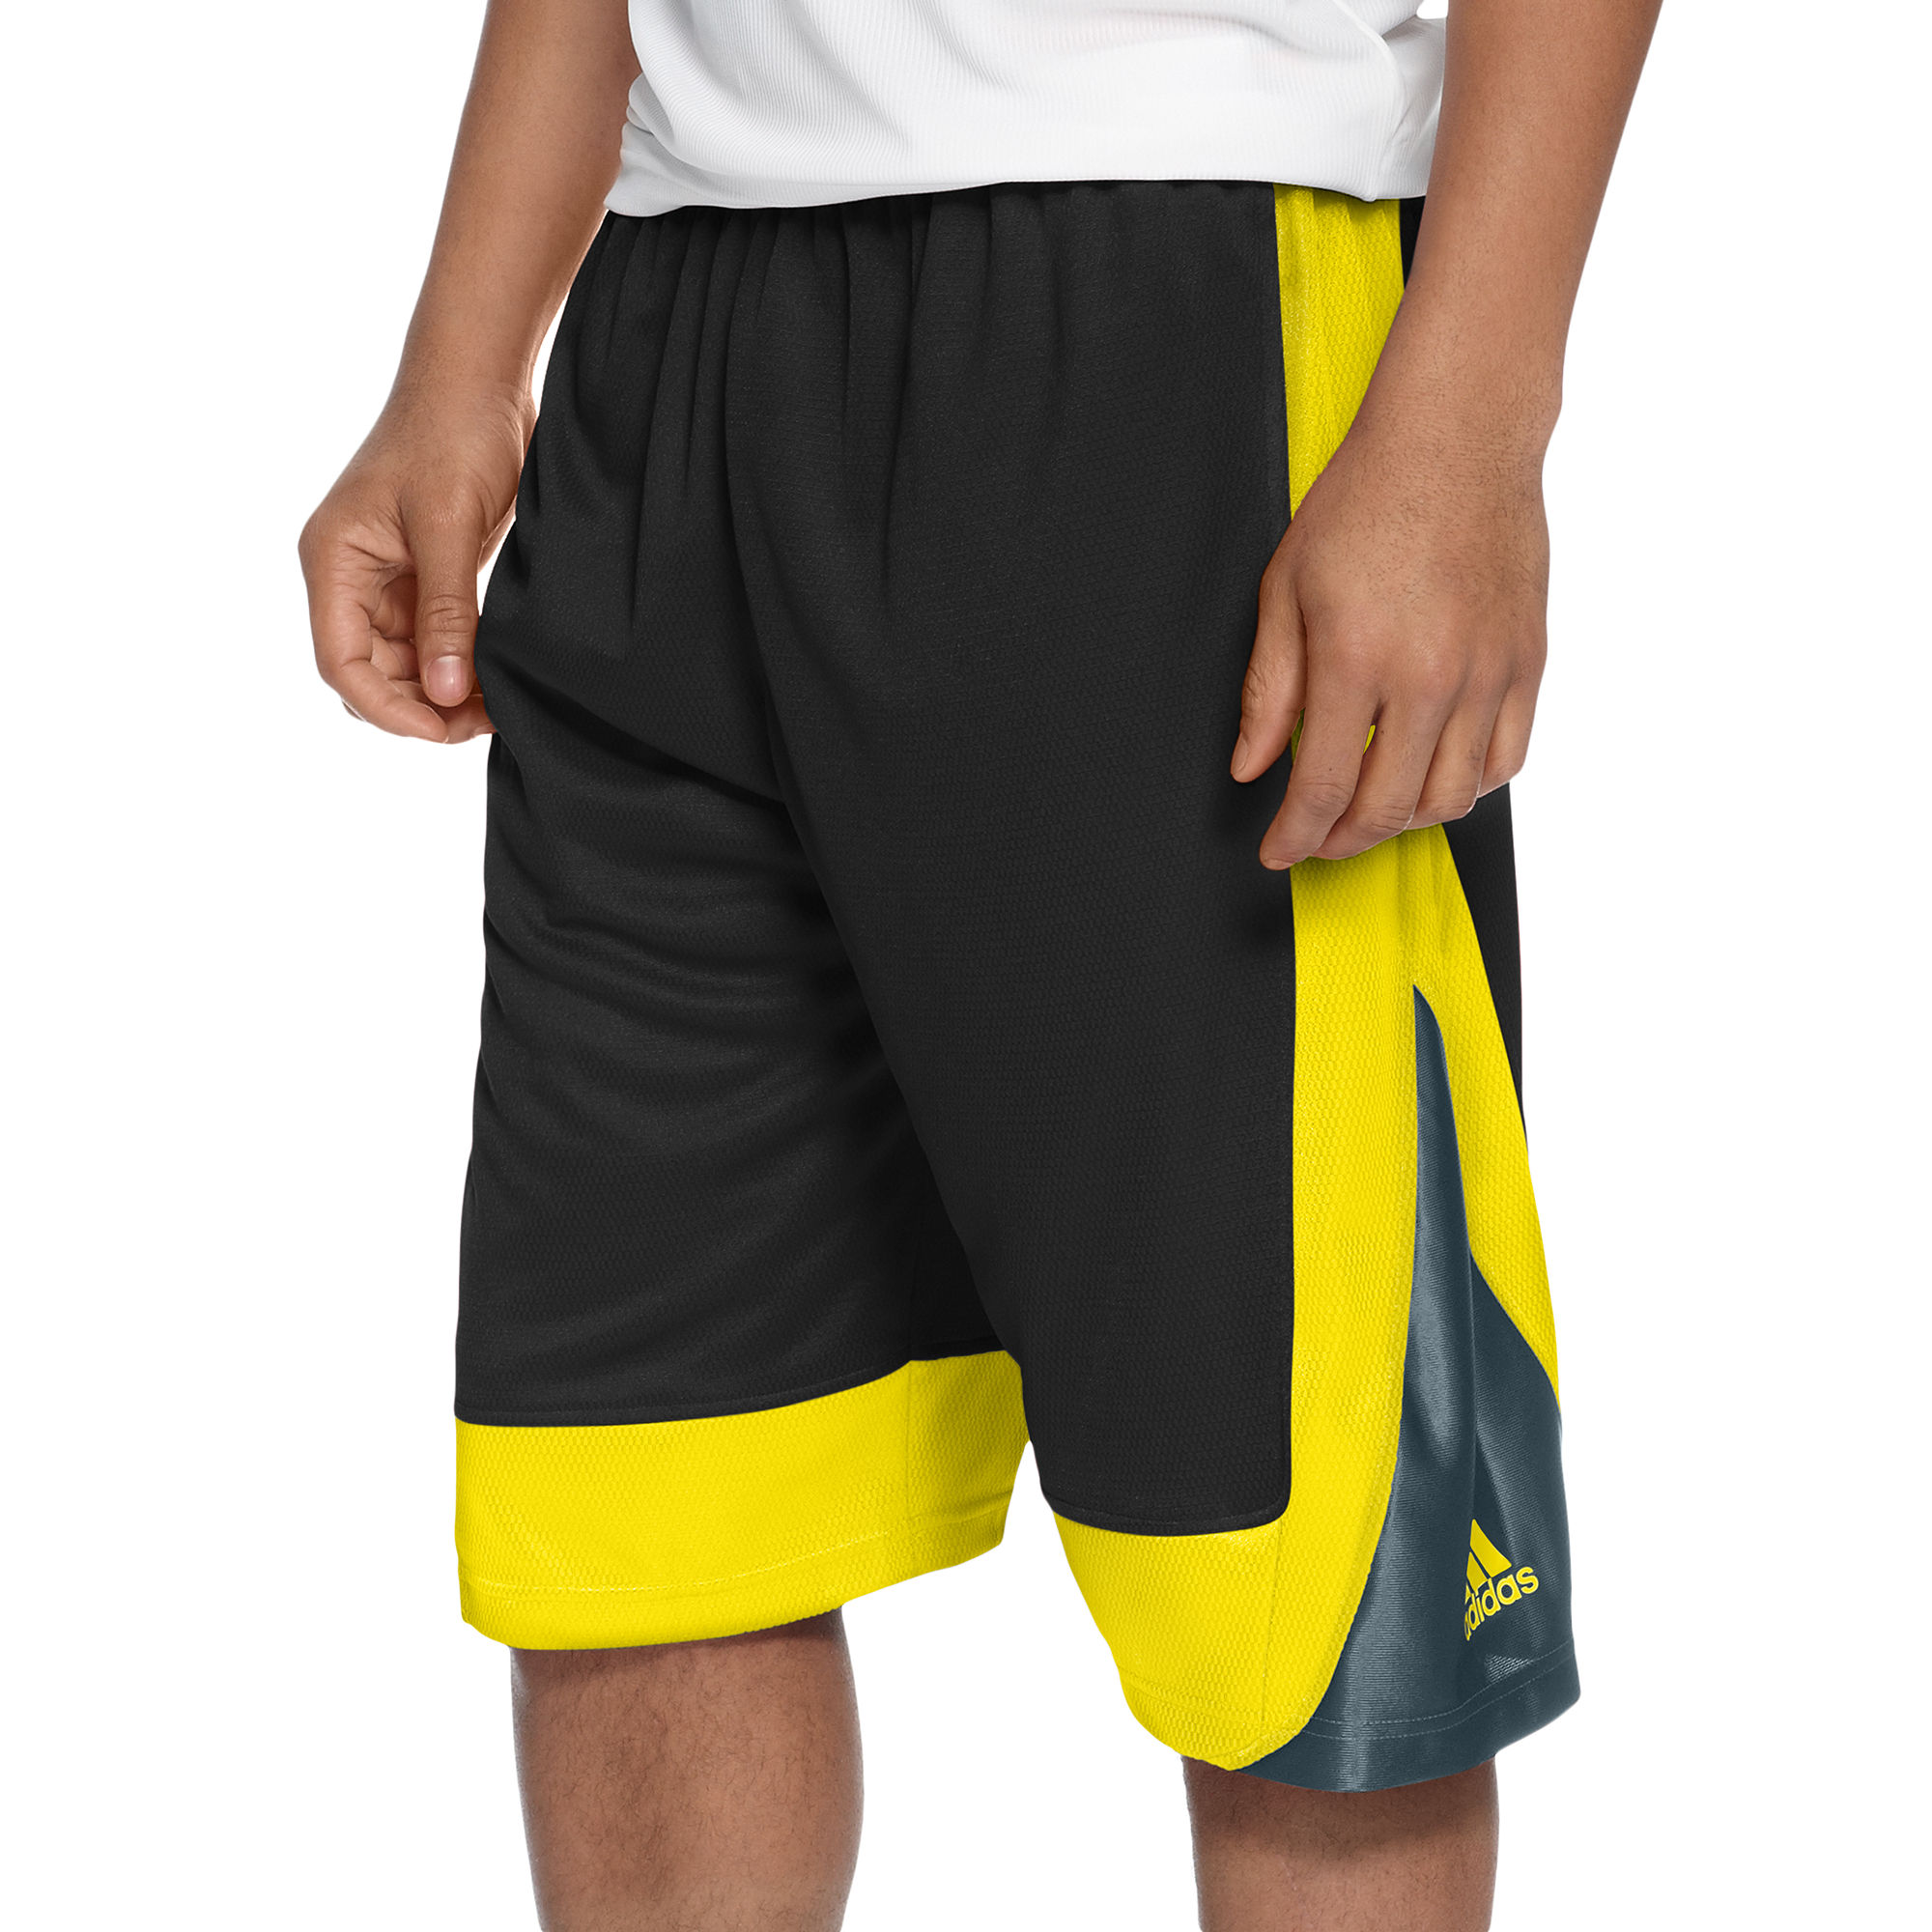 8097948cbb15 adidas-blackdark-onixvivid-yellow-crazy-shadow-climalite-basketball-shorts -product-1-12487160-160144659.jpeg